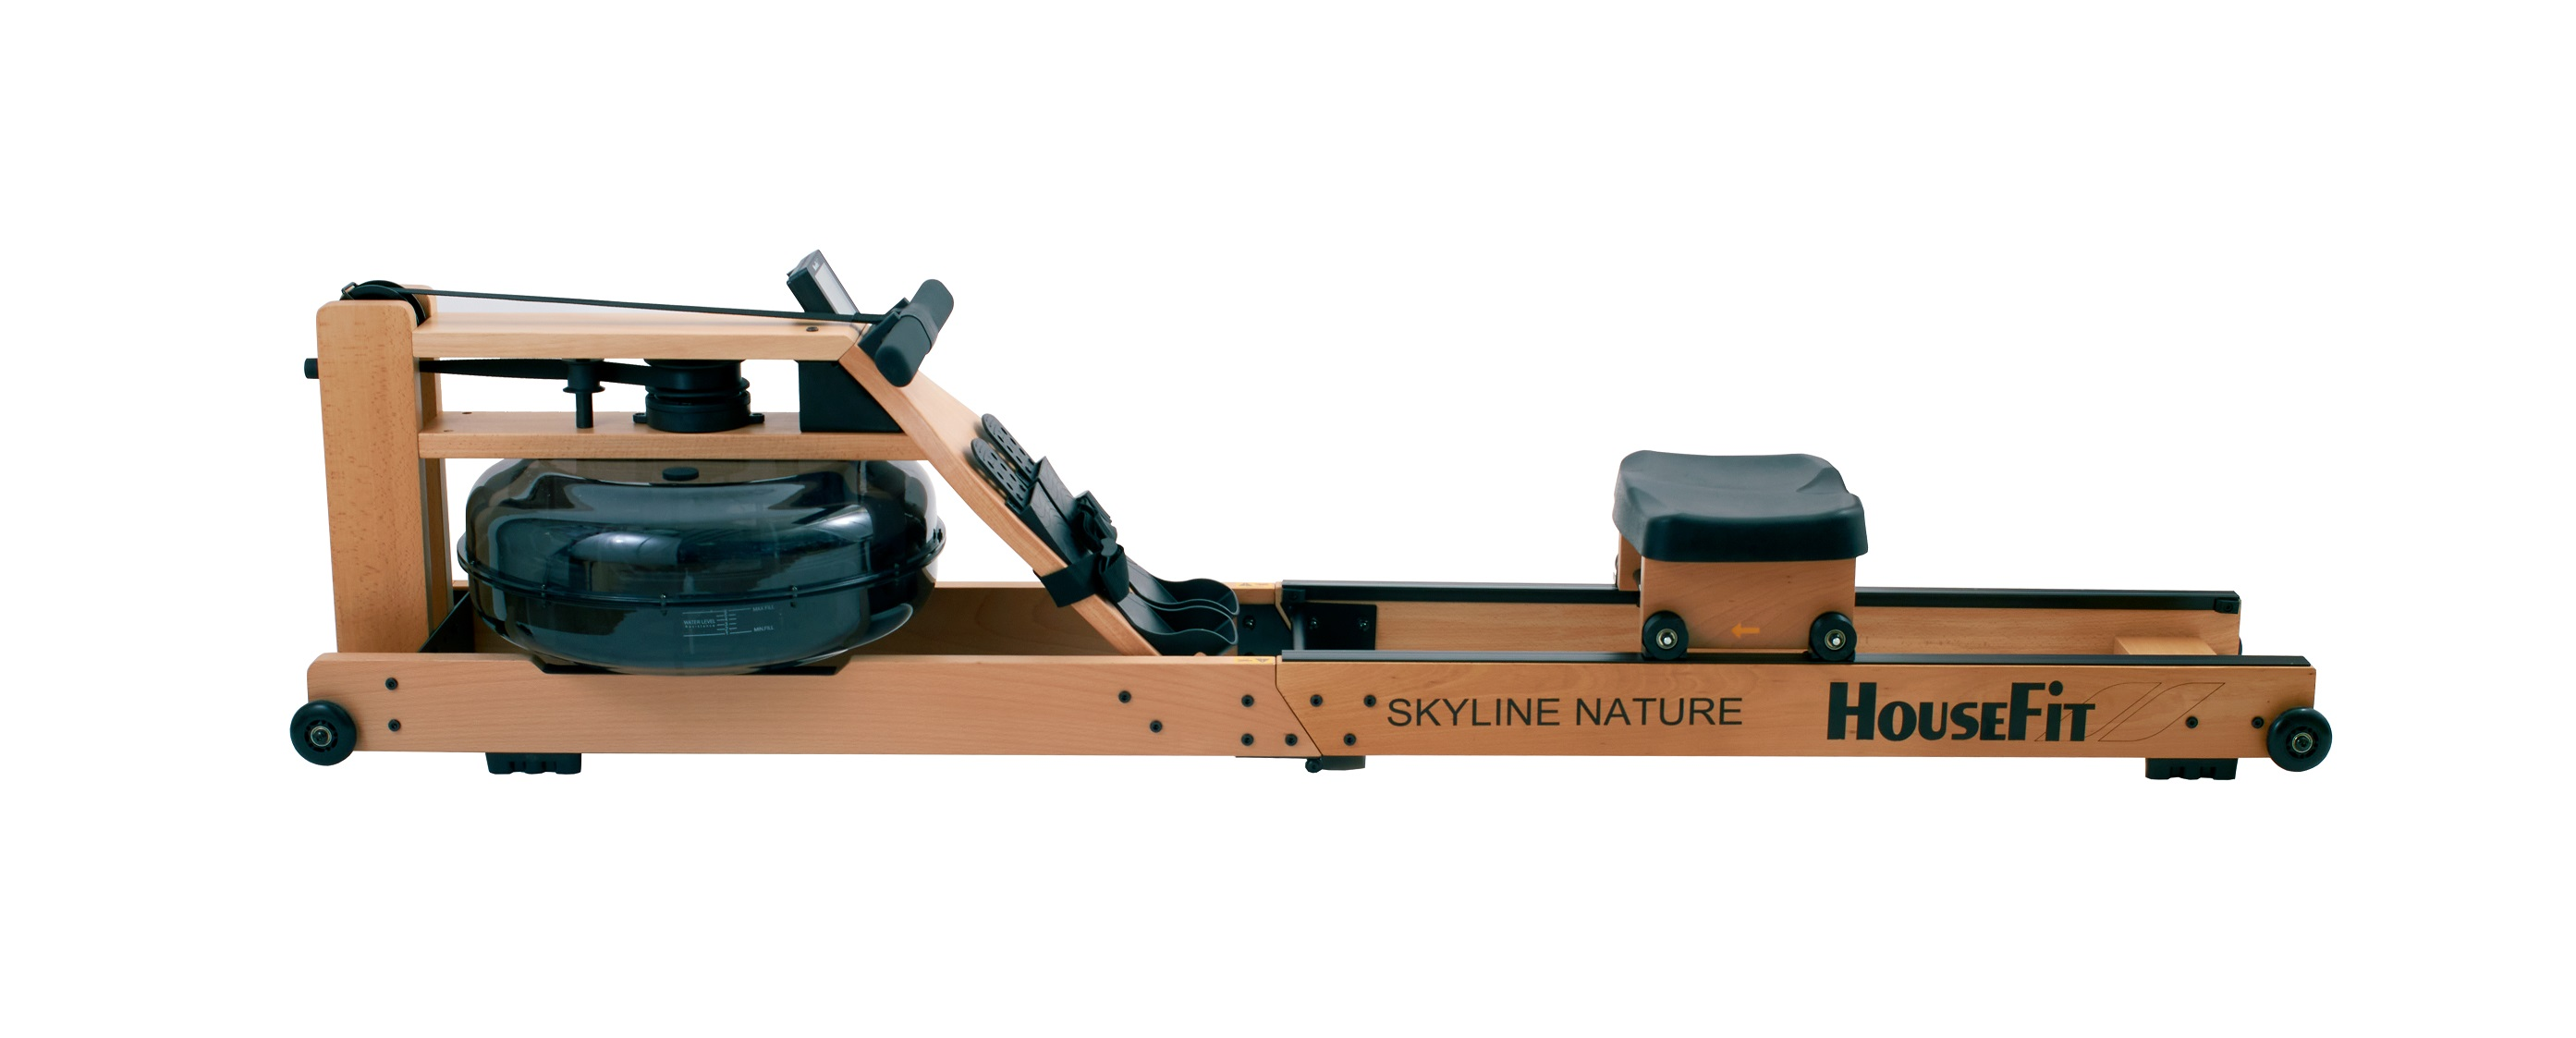 Гребной тренажер HouseFit SKYLINE NATURE (Арт.DH-8634)